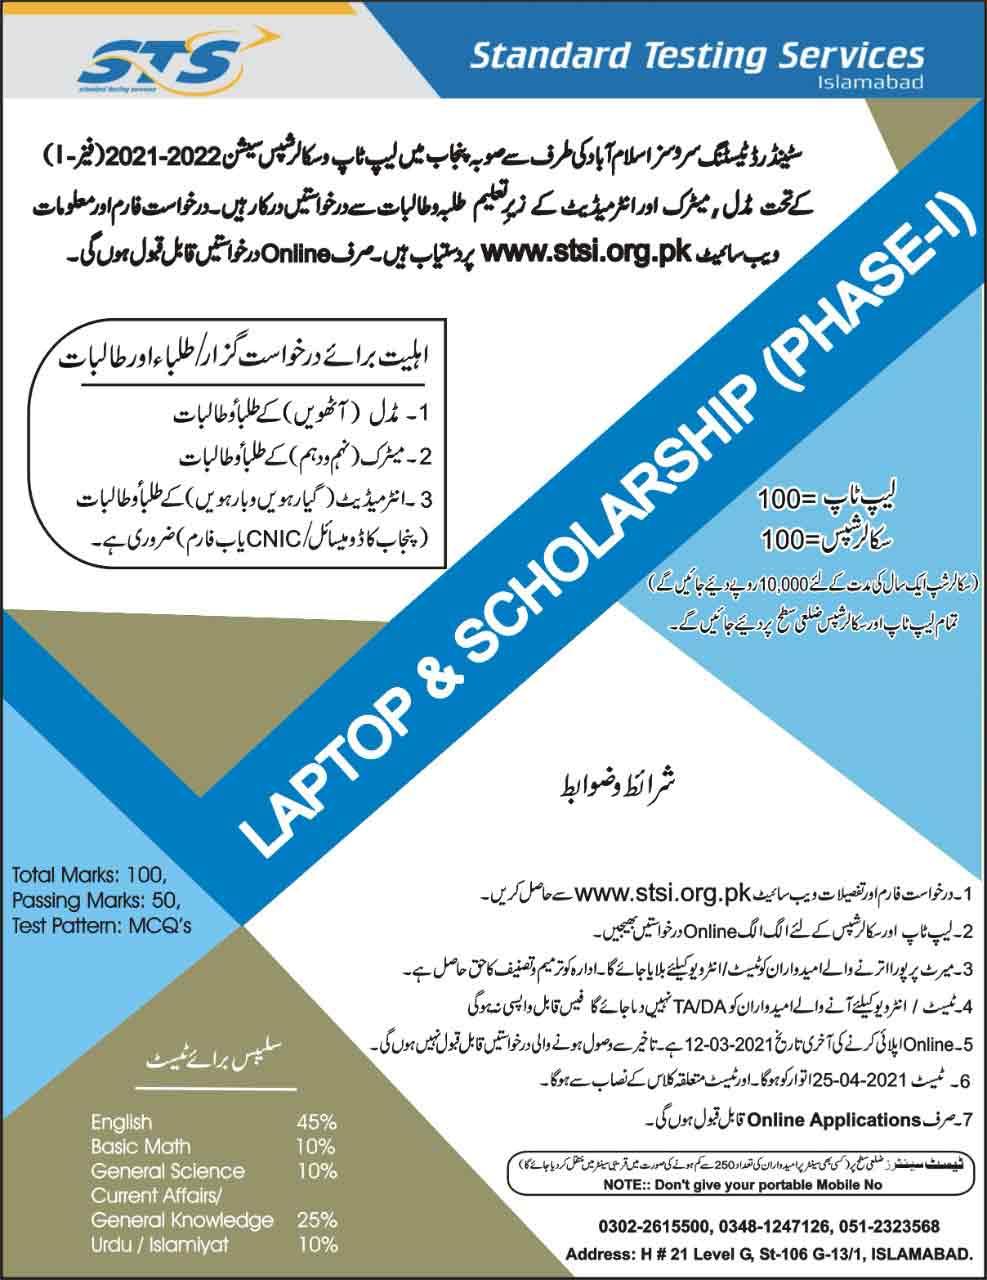 STSI-Laptop-Tab-Scholarship-Scheme-2021